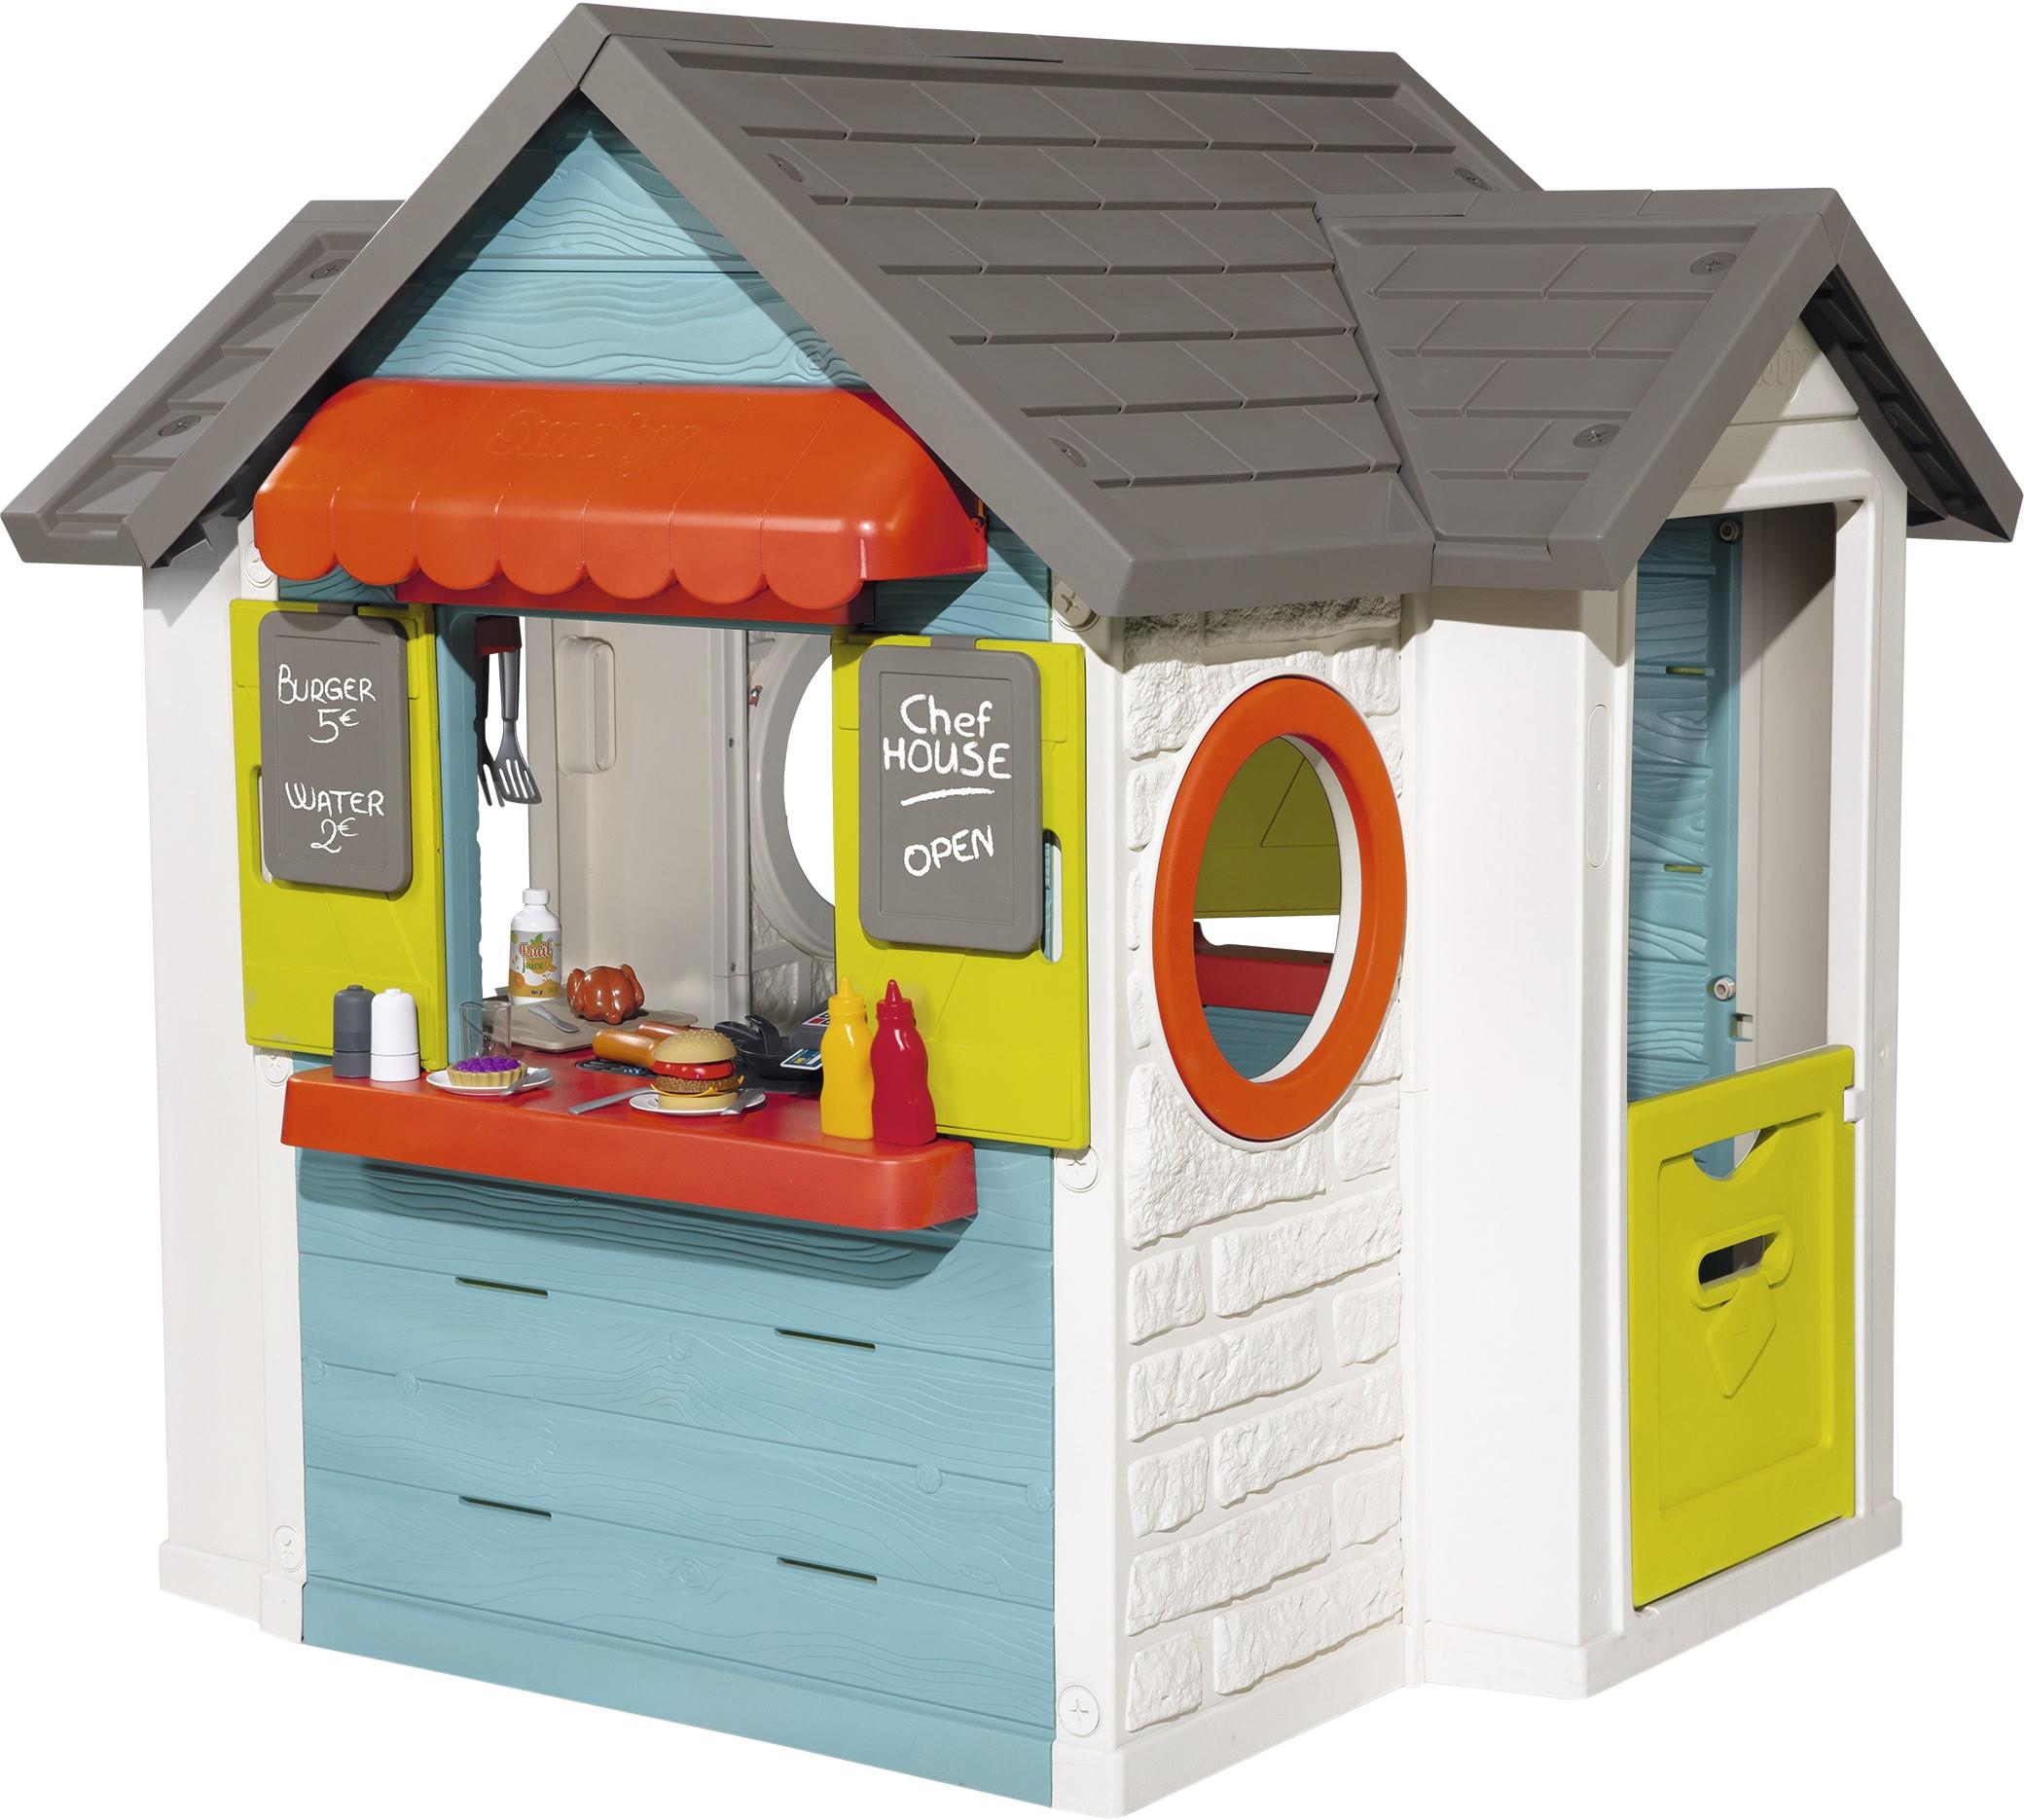 Chef House Hamburgeria